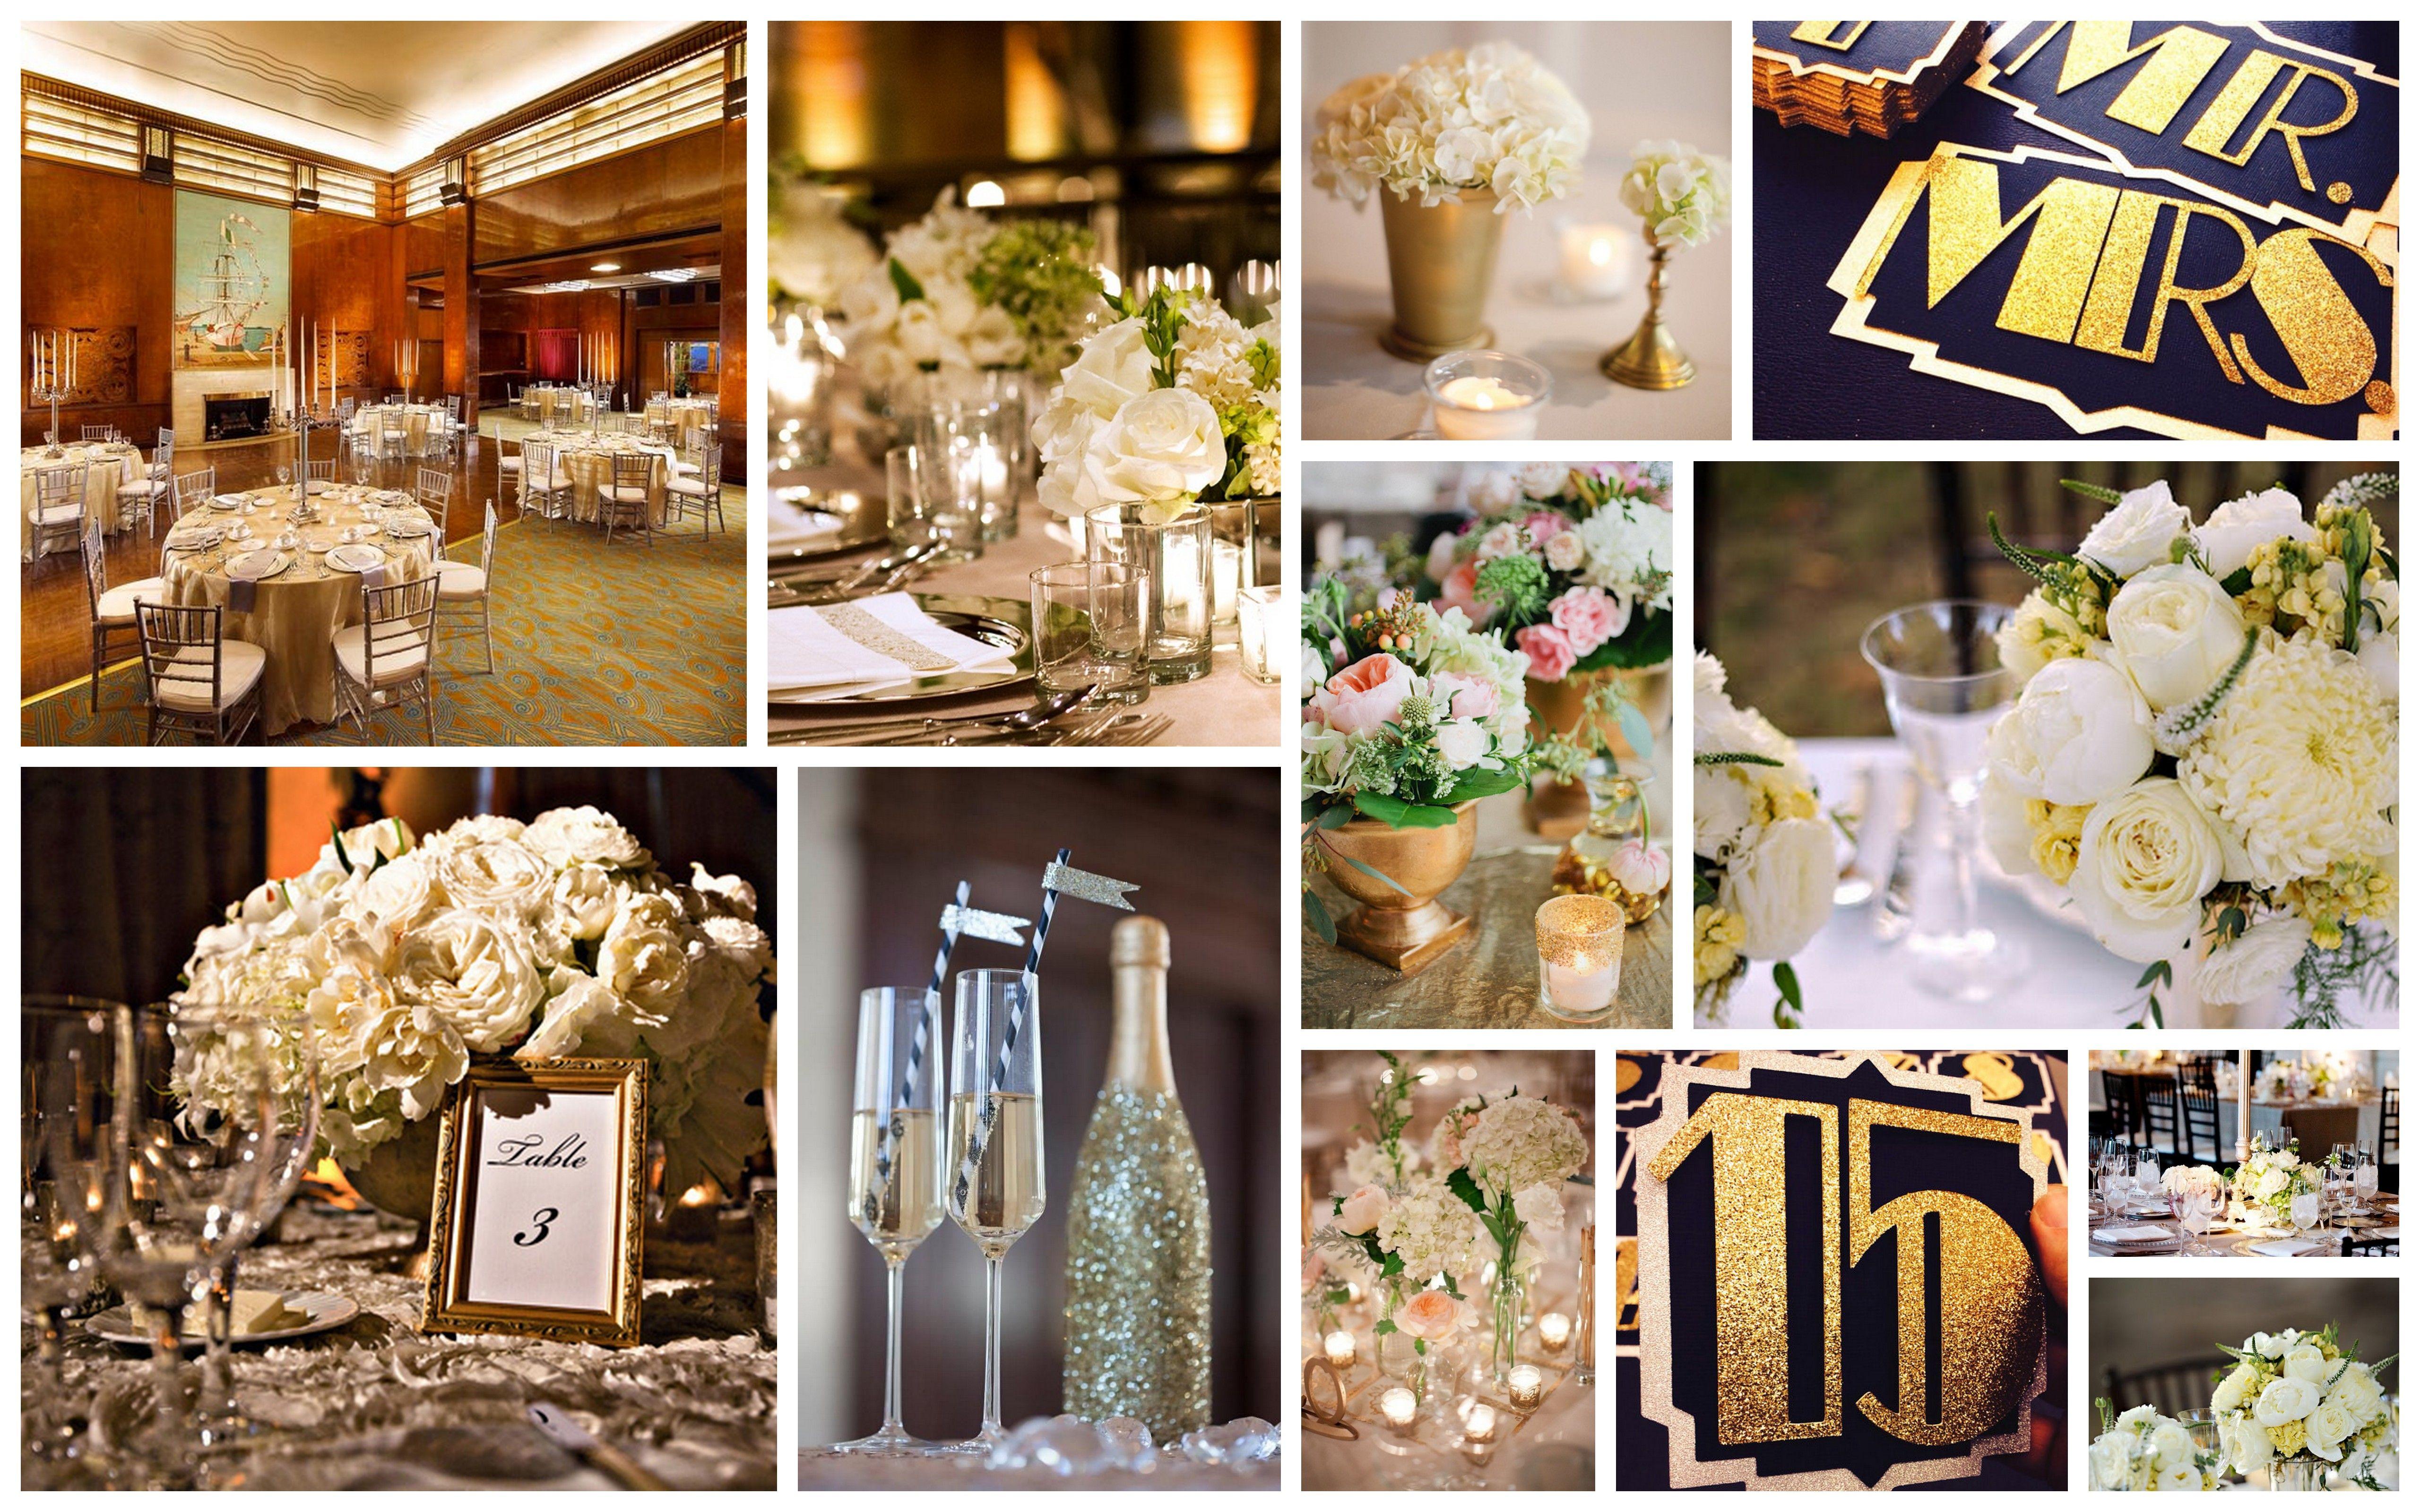 wedding decor, gatsby, gold, white, silver, glitter